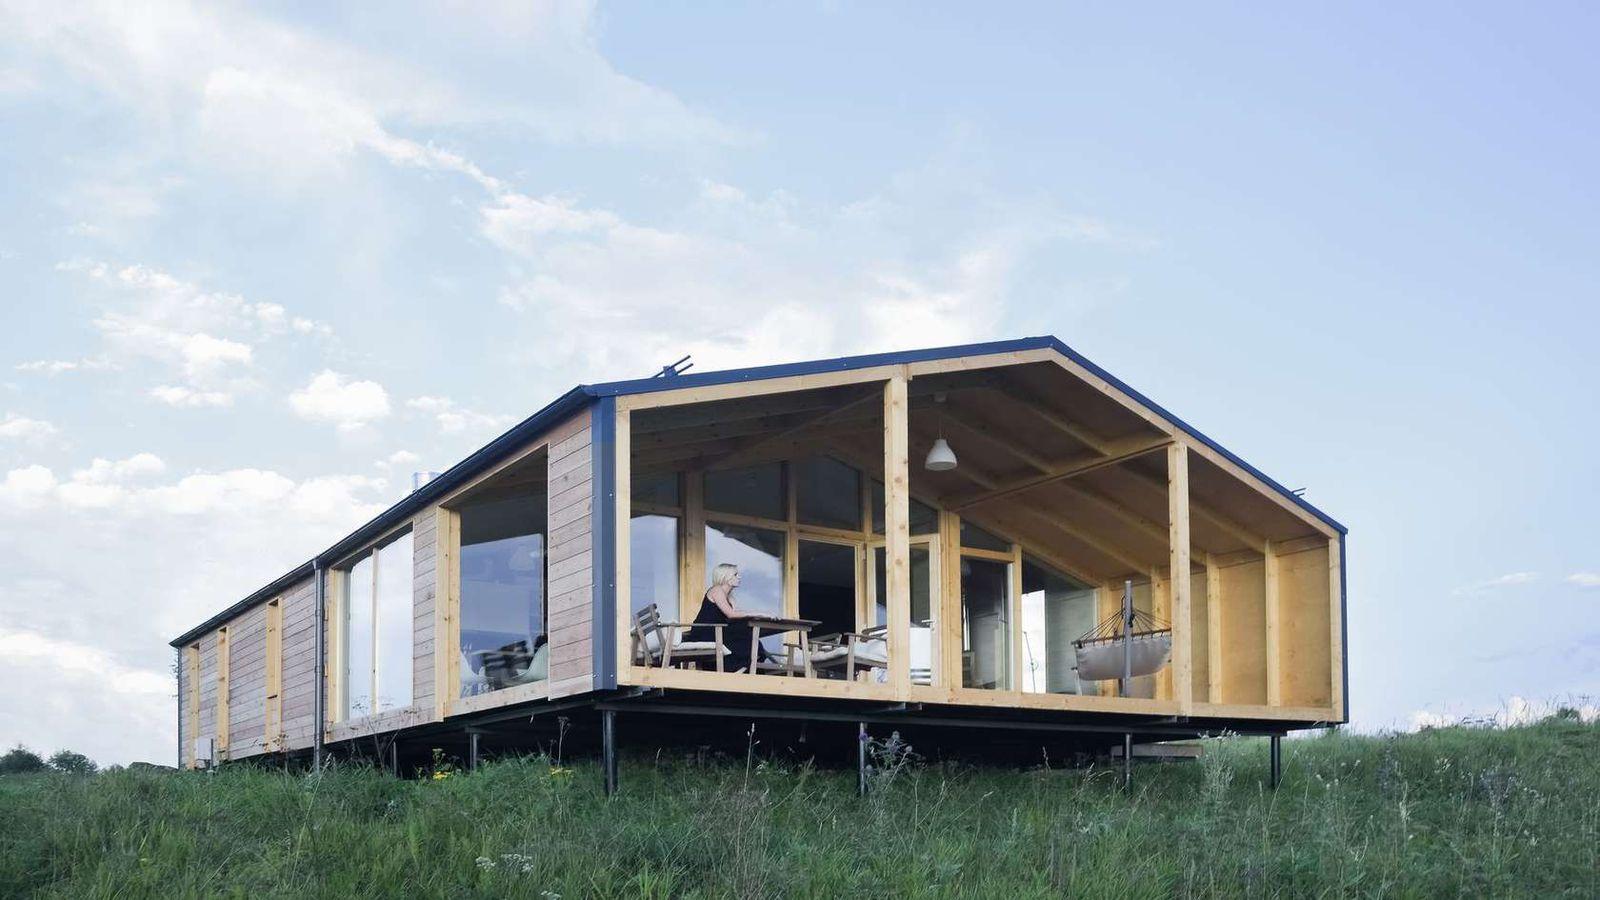 Affordable Prefab Cabin Dubldom Now Accepting U.S. Pre